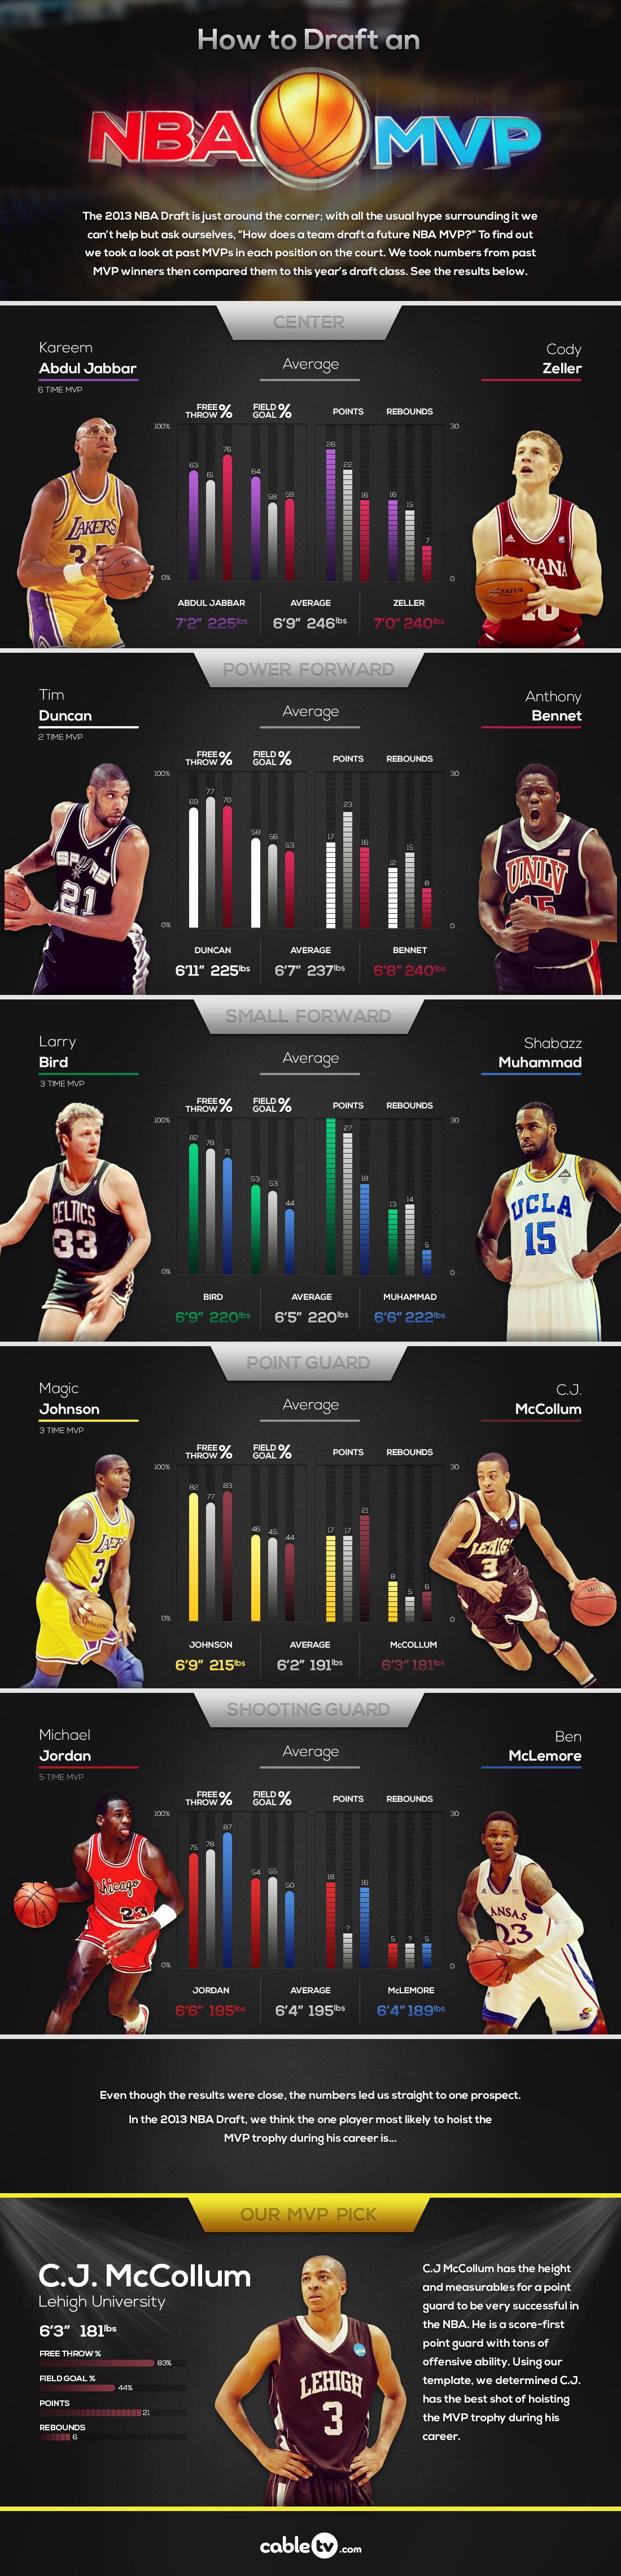 How to Draft an NBA MVP